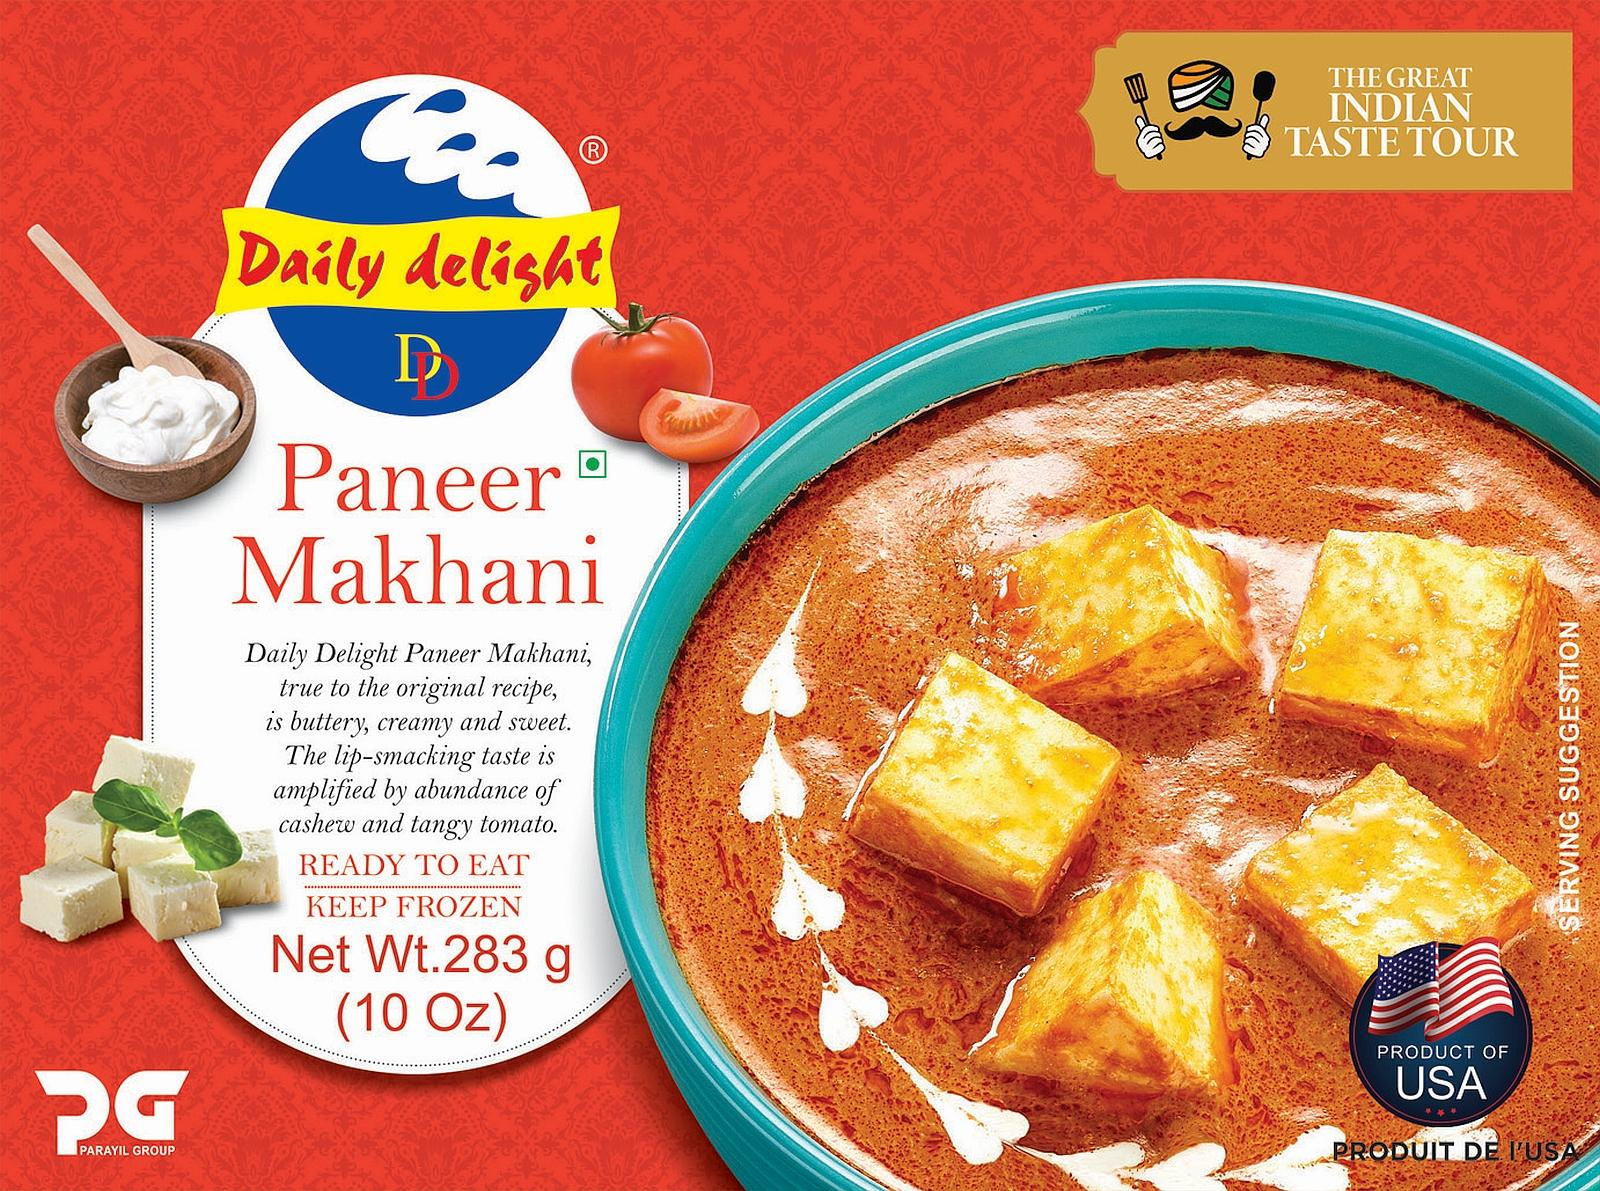 Daily Delight Paneer Makhani